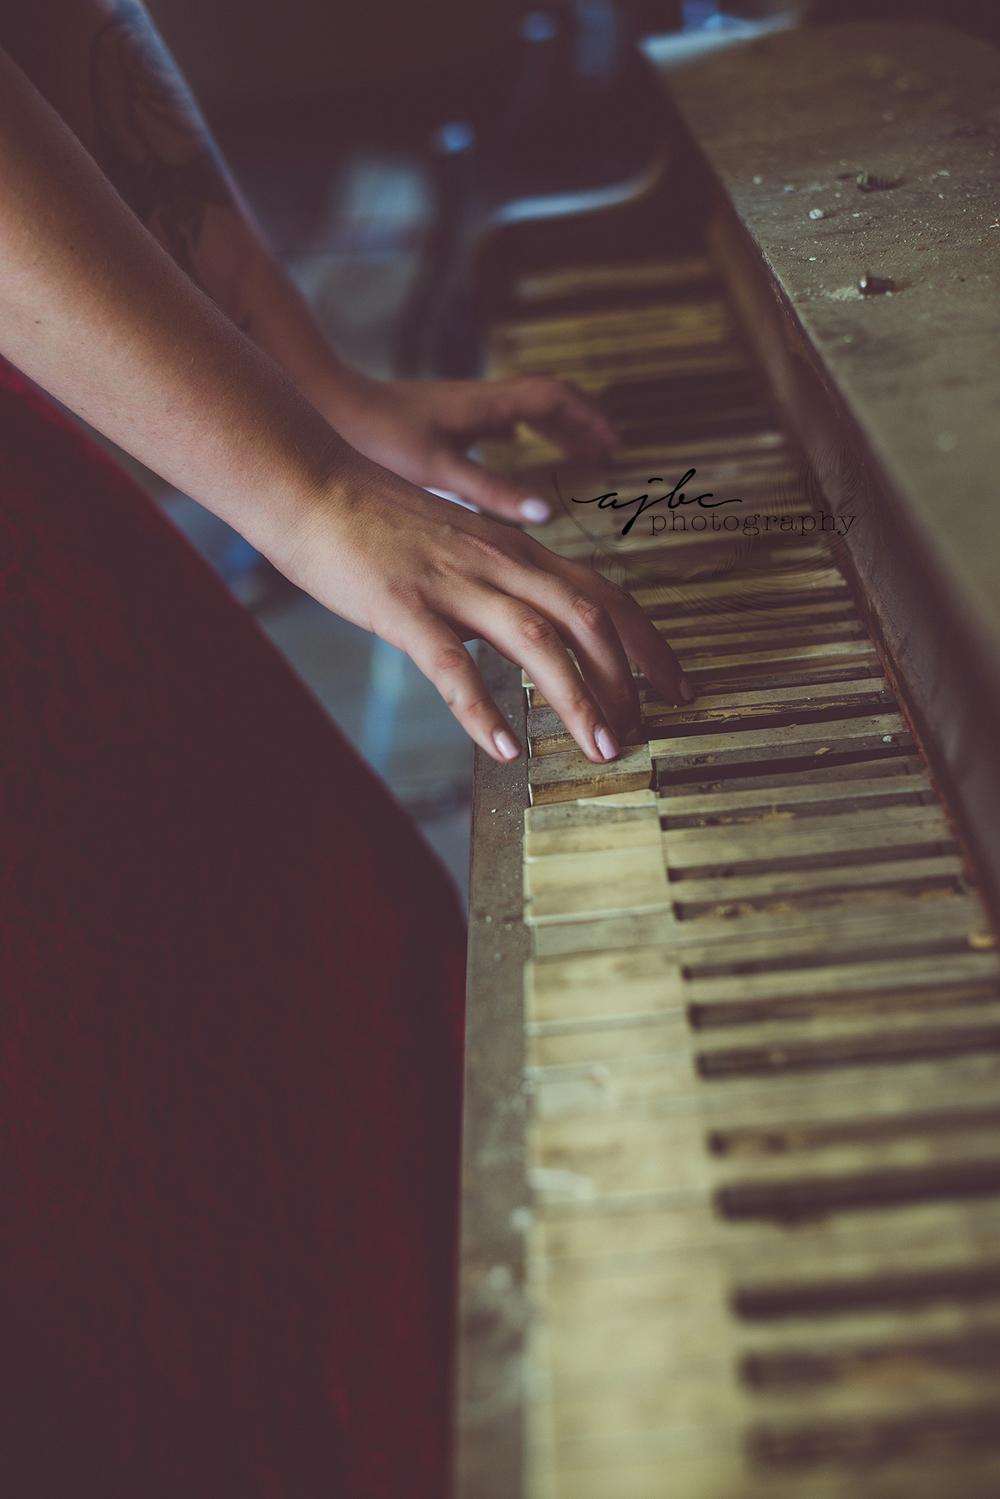 111 old vintage piano spooky.jpg